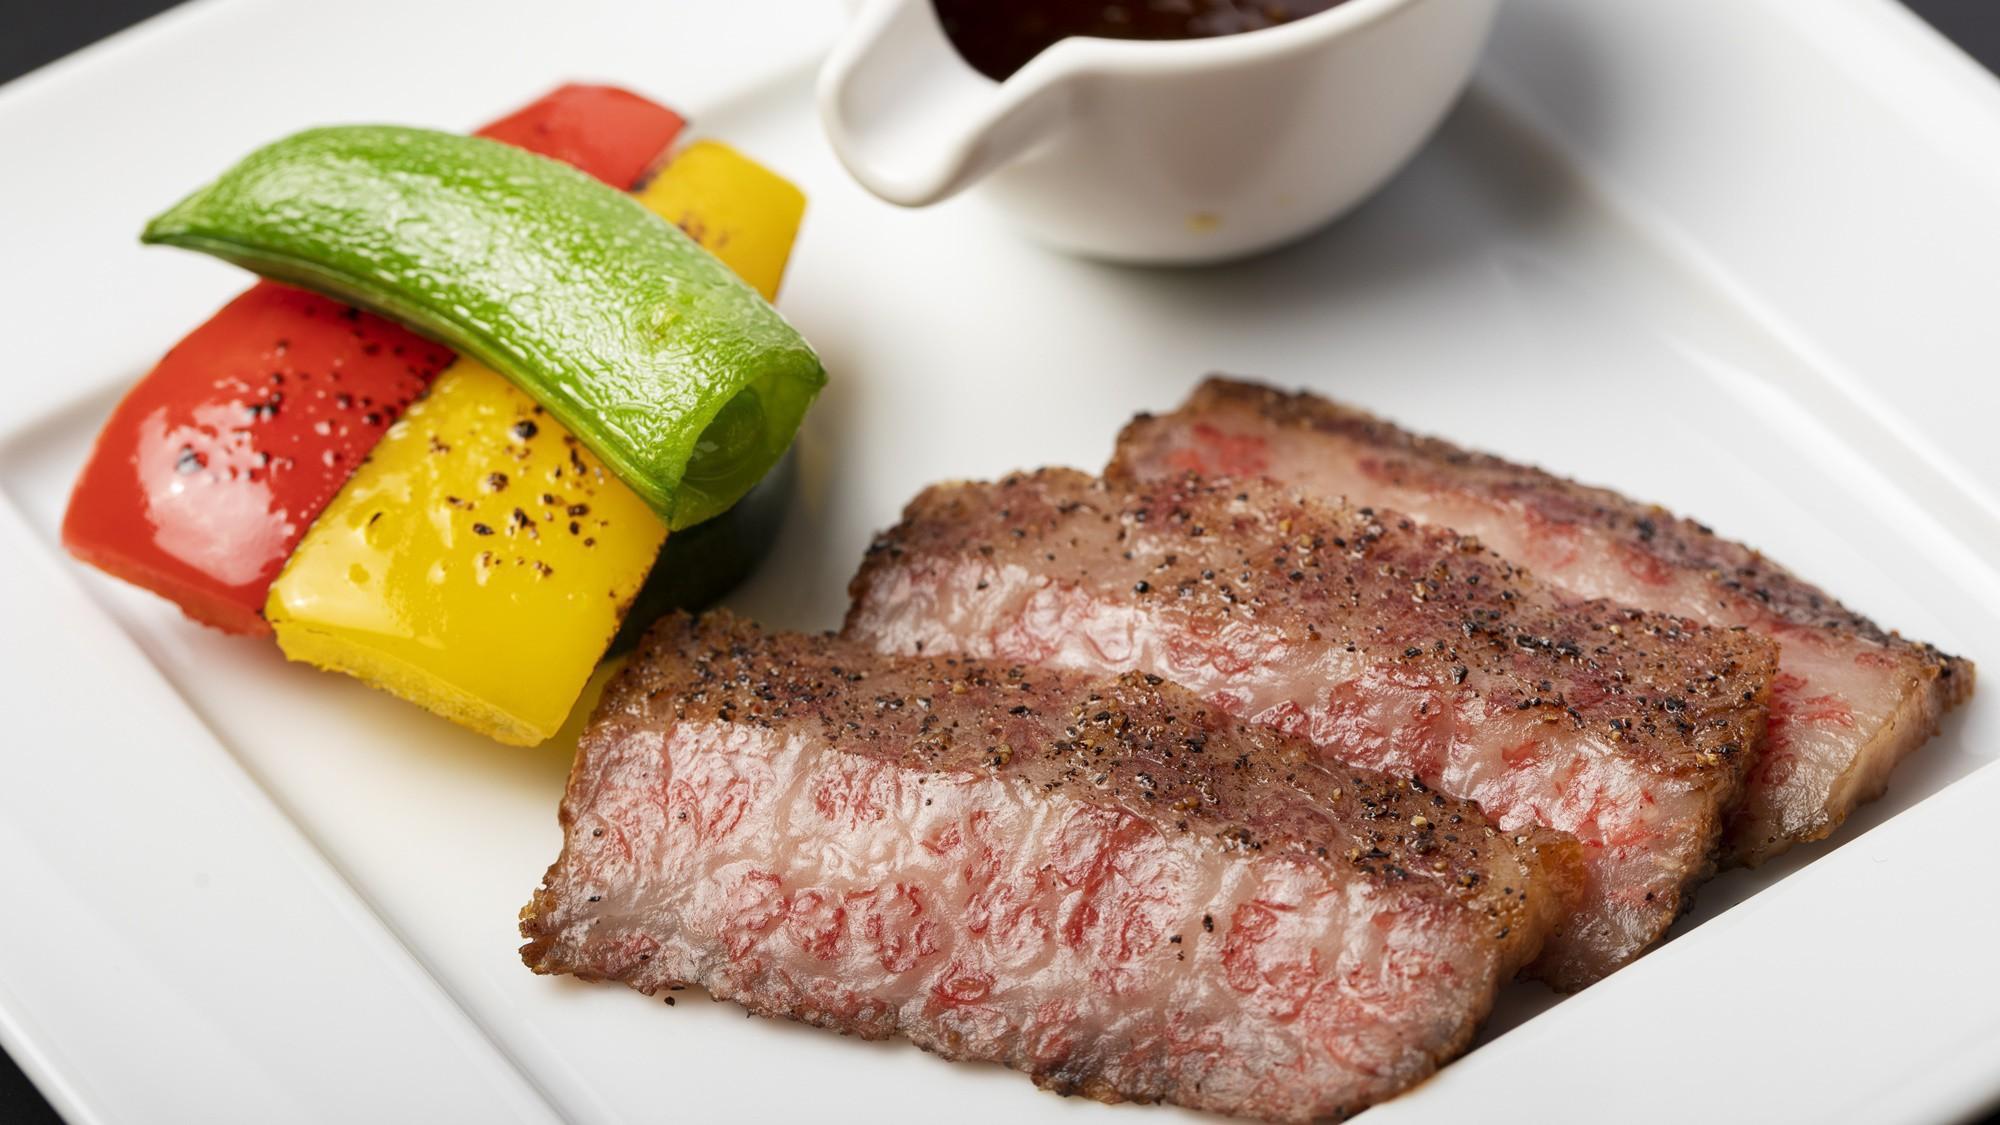 「A5愛鷹牛ステーキ」地元の黒毛和牛を使ったステーキは絶品!※写真は一例